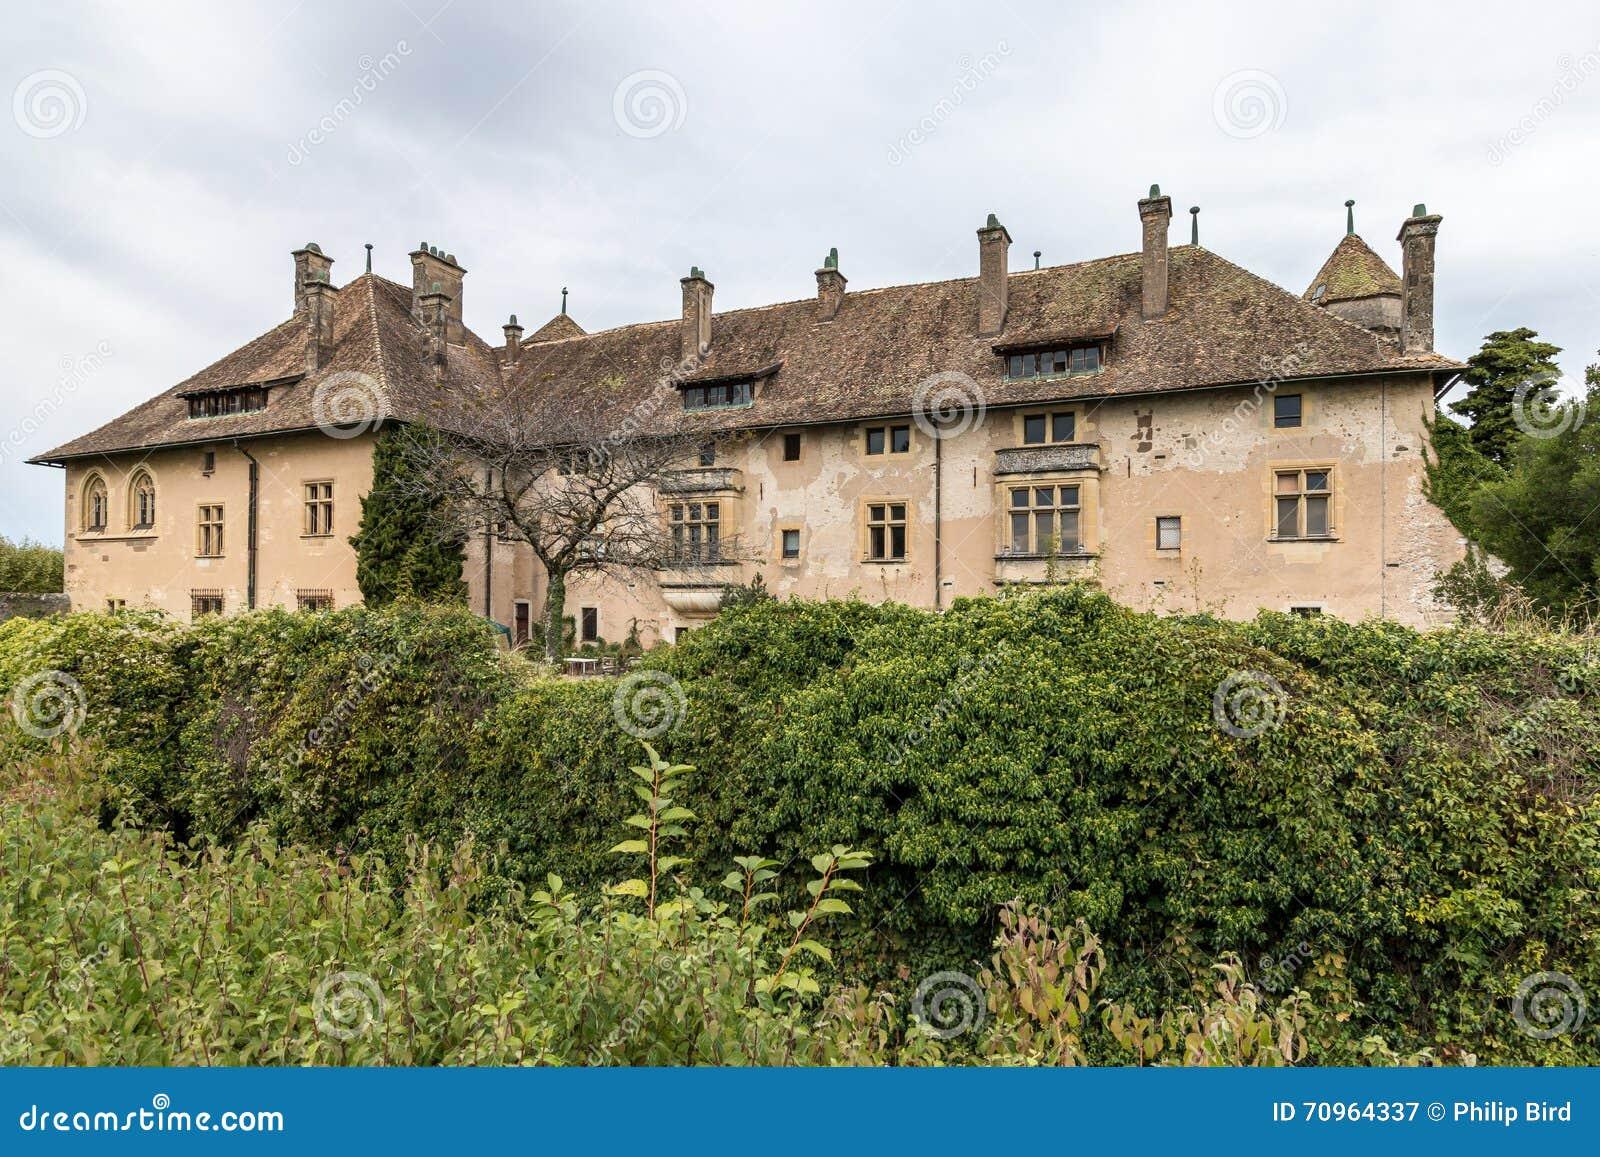 THONON-LES-BAINS FRANCIA EUROPA - 15 DE SEPTIEMBRE: Chateau de Ripai